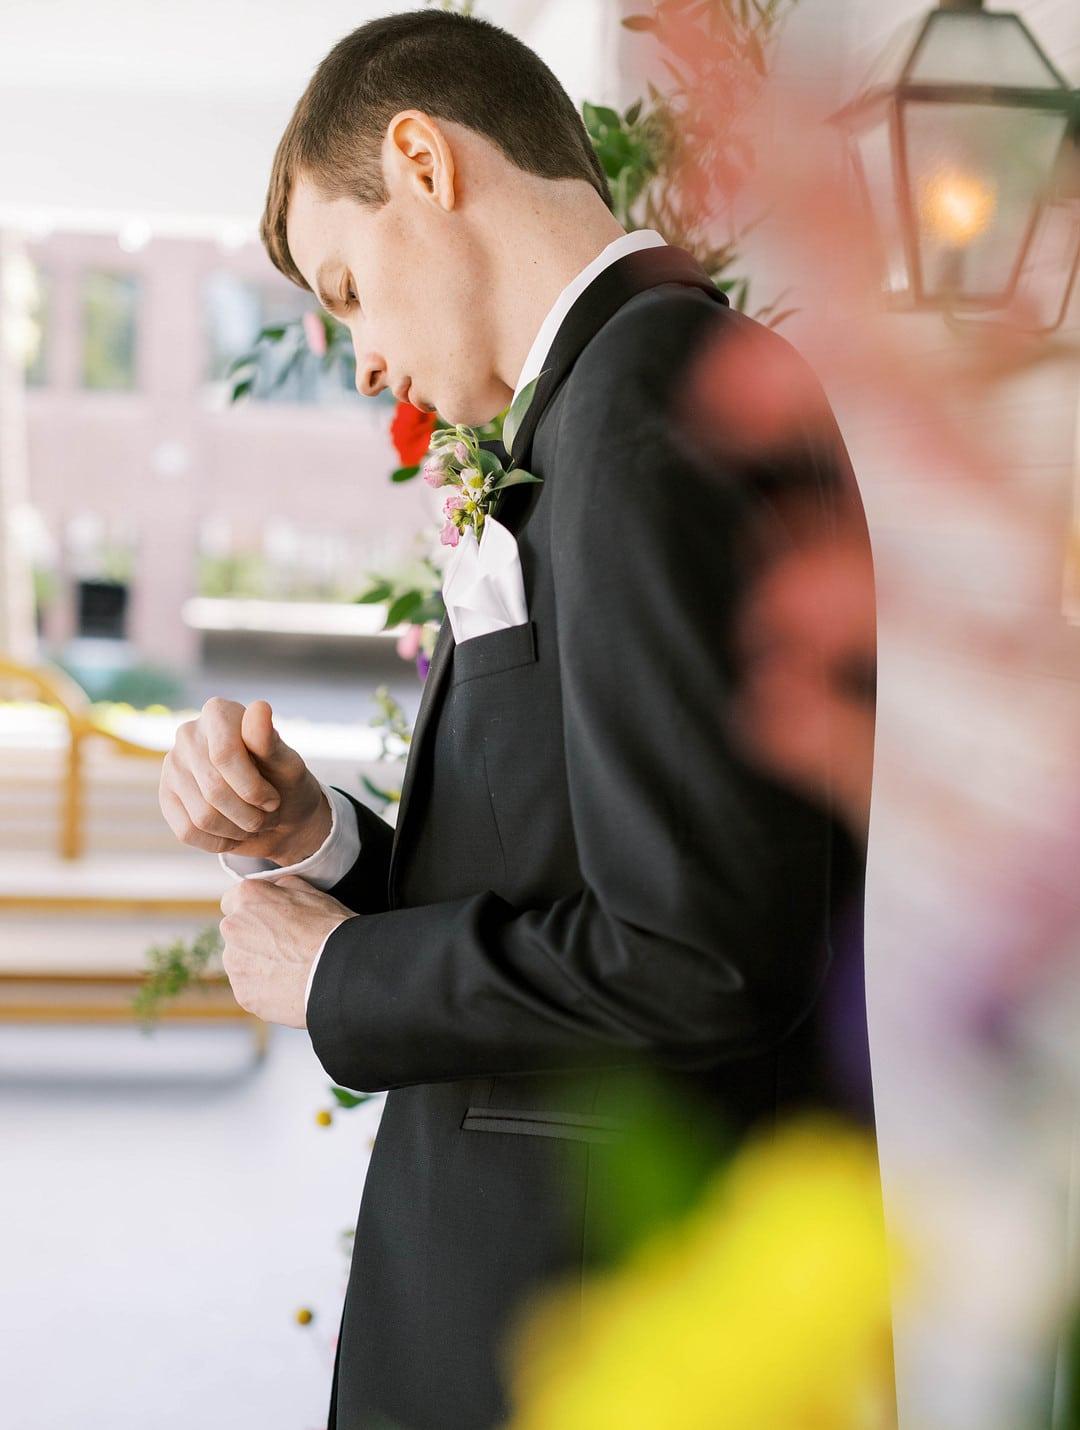 70's Inspired Wedding - Styled Shoot 52